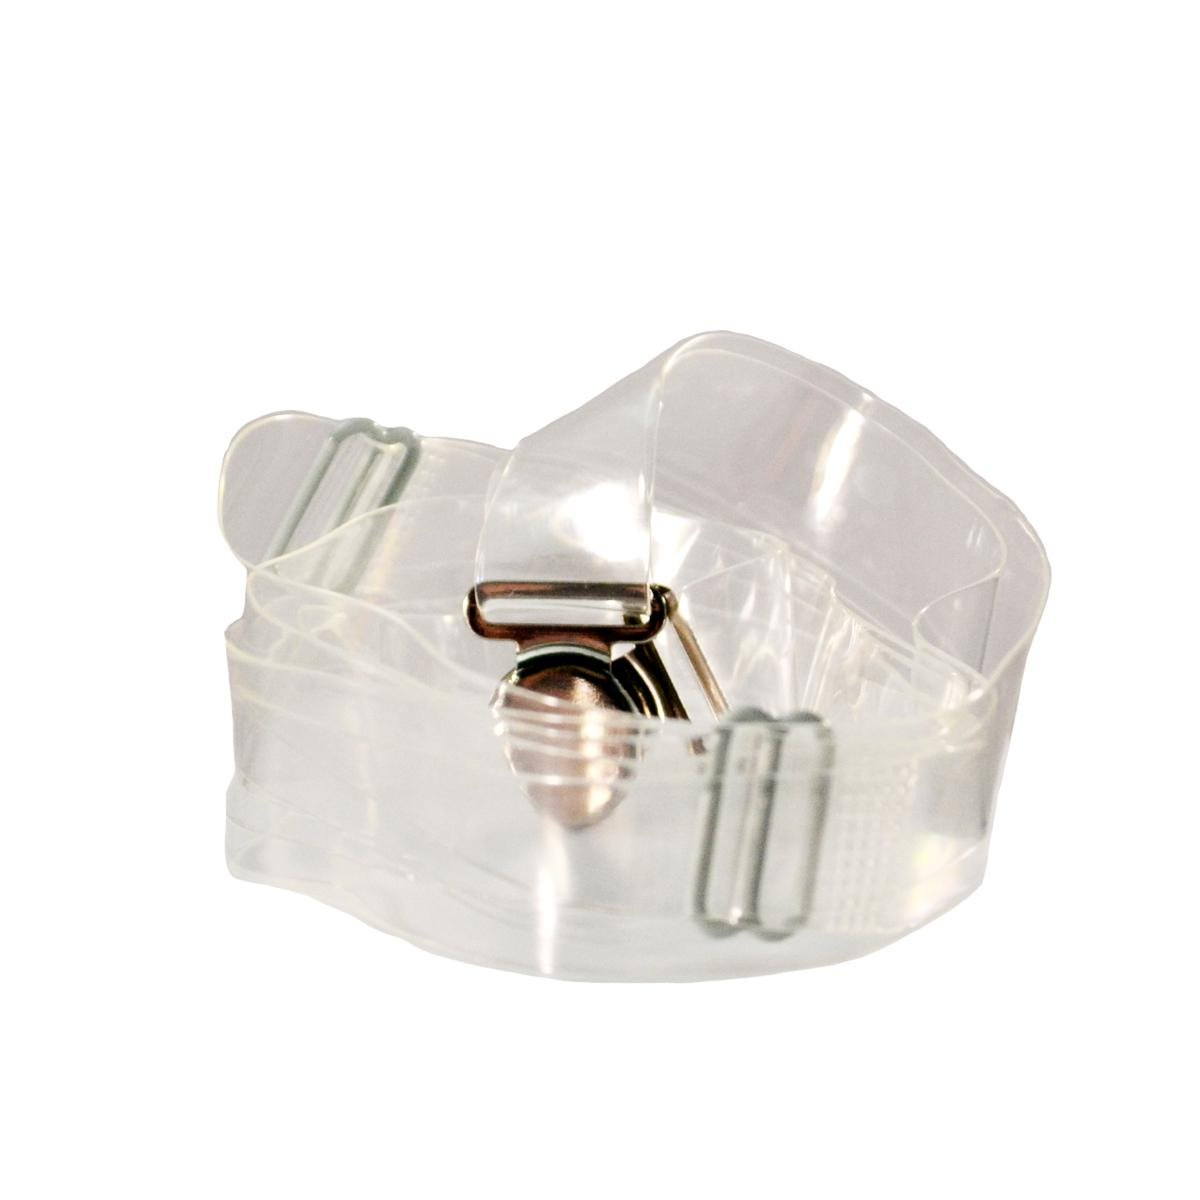 isABelt Skinny Lay Flat Women's Belt +Magnetic Clasp